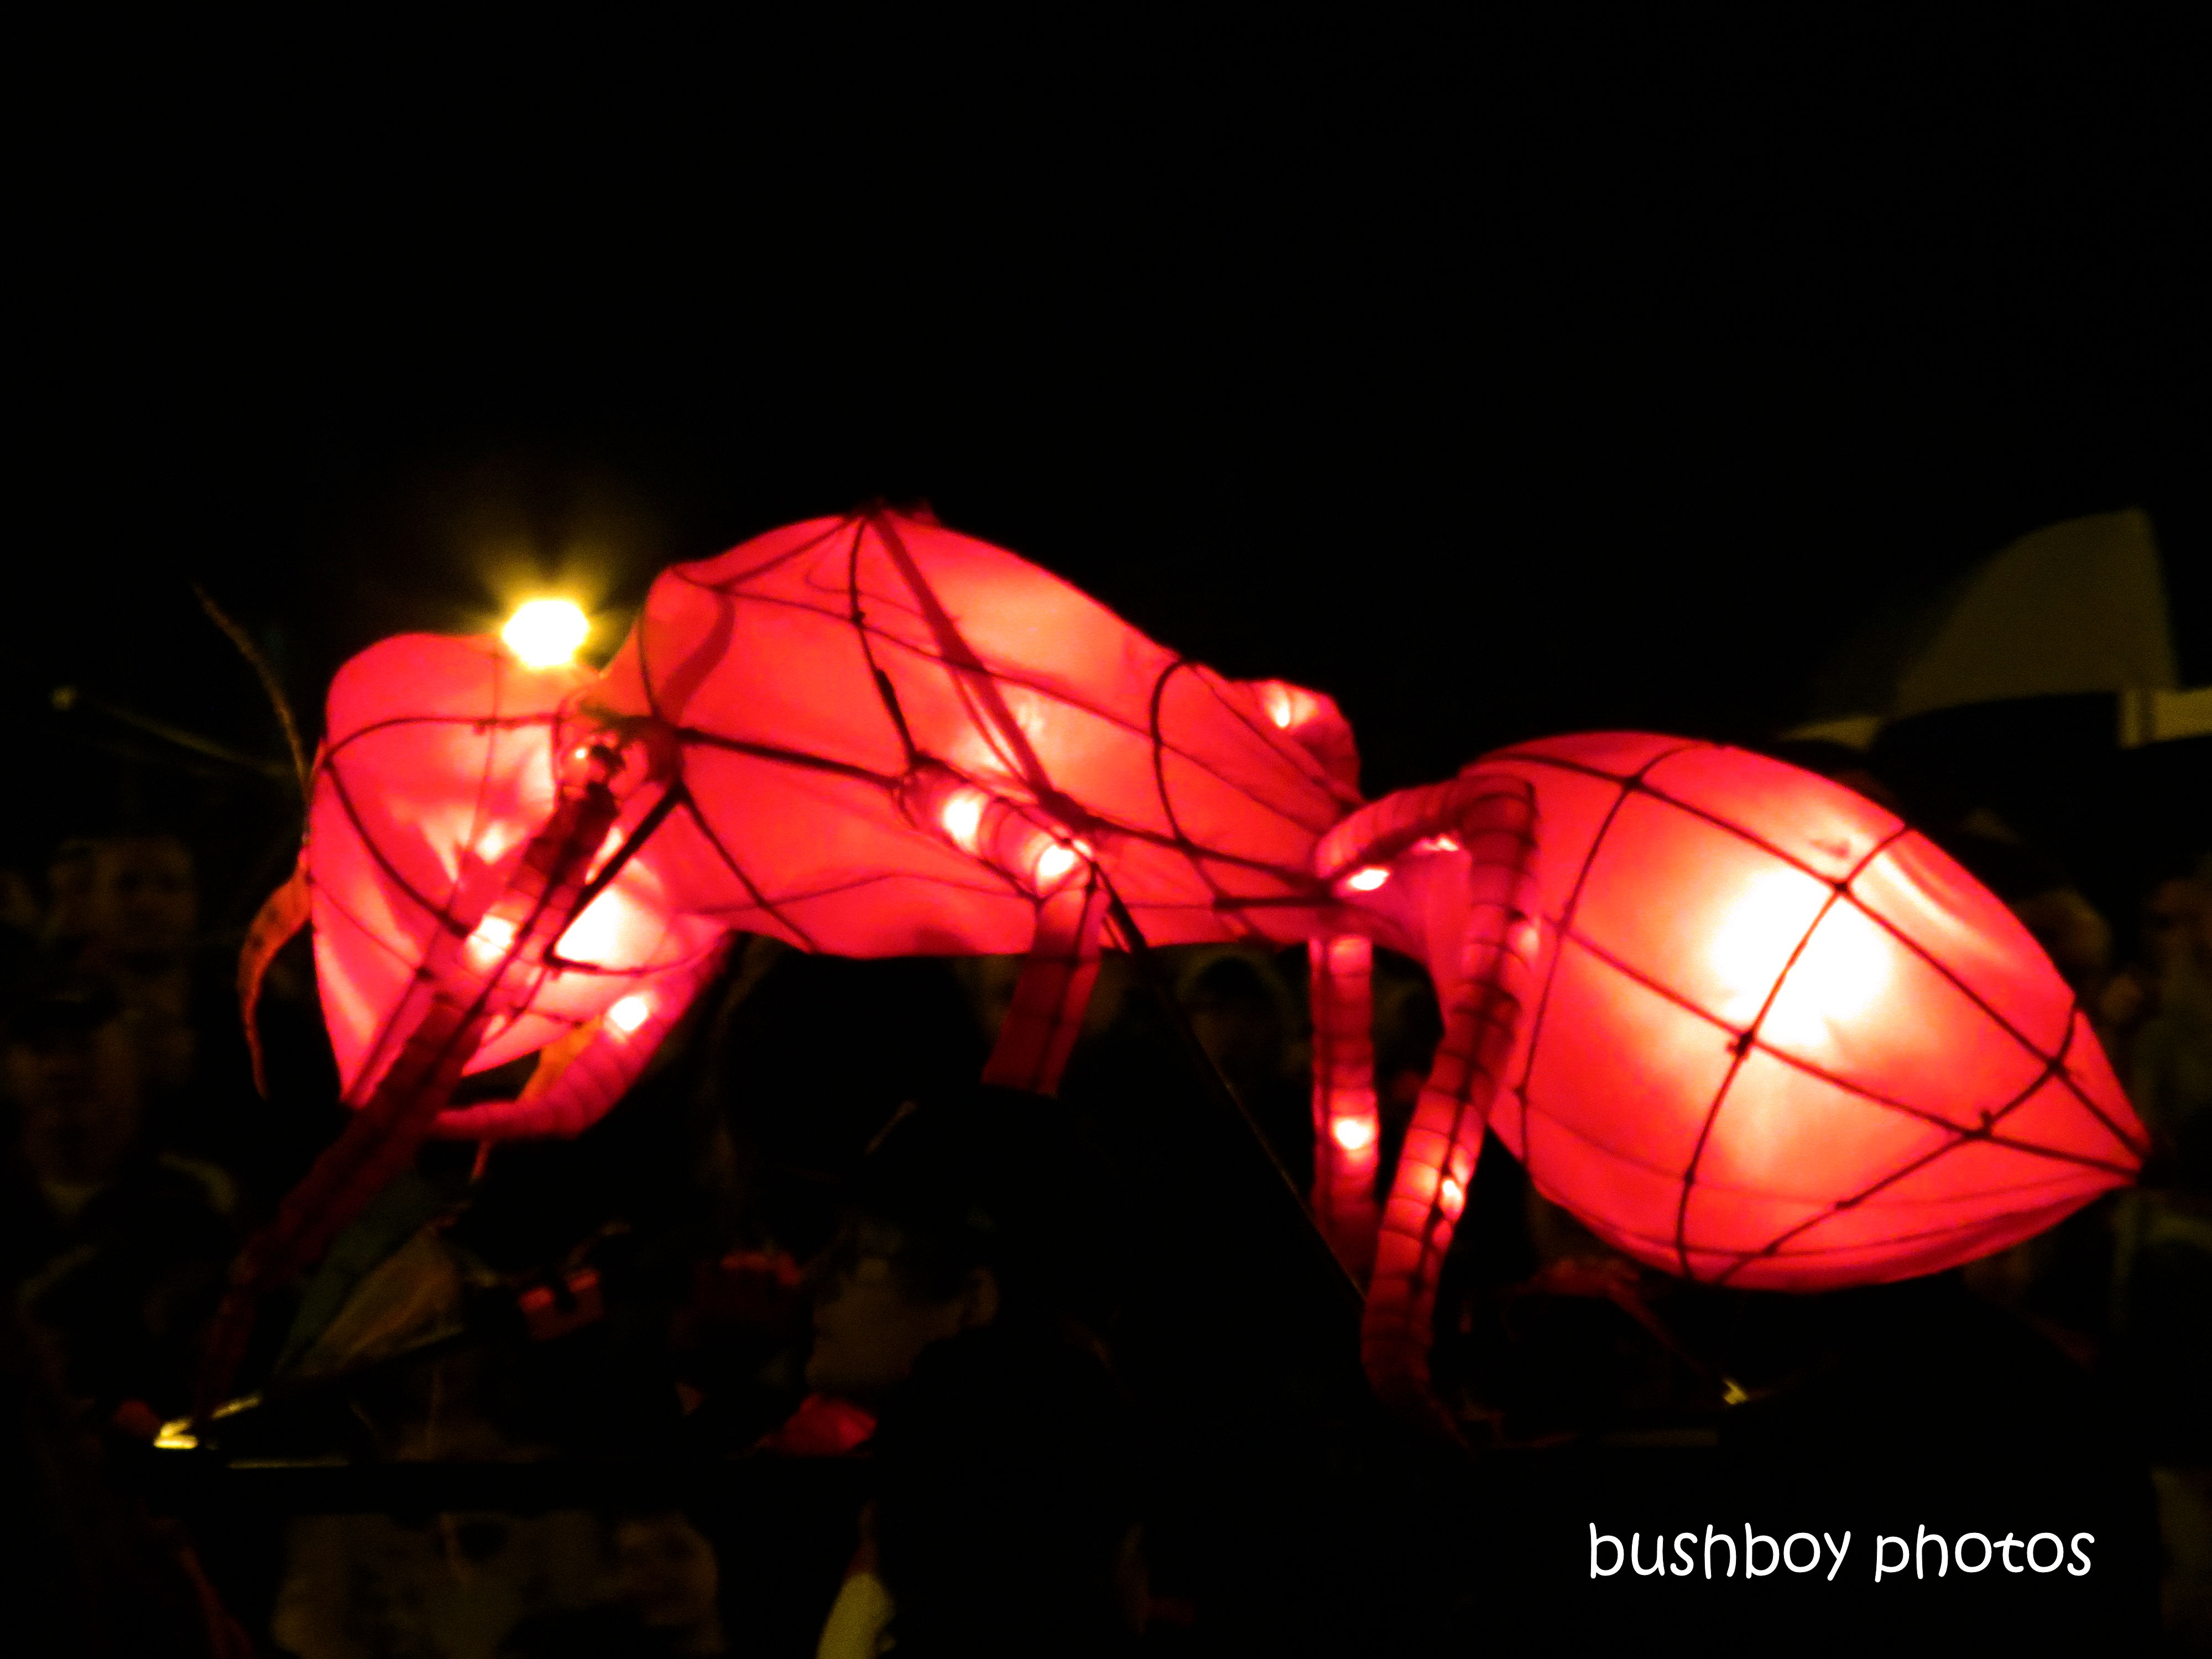 191120_blog_challenge_fantasy_red_lantern_lismore_bullant